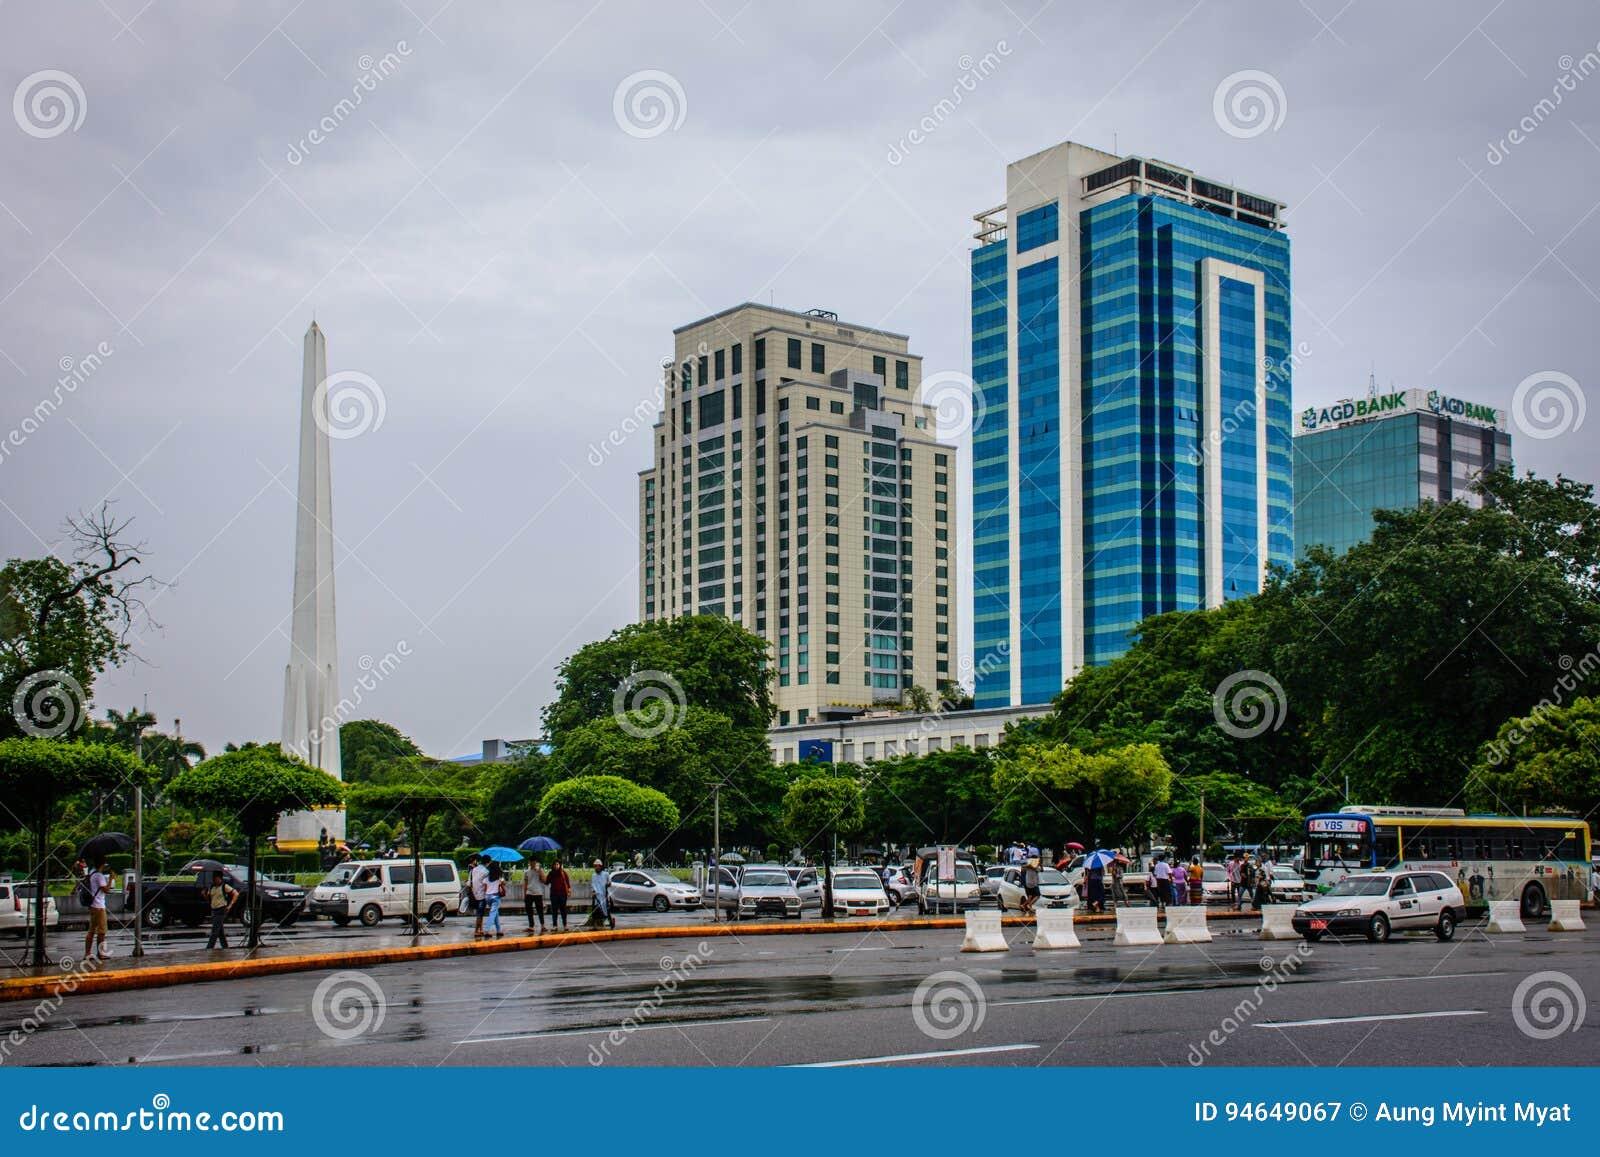 Downtown Area Of Yangon In The Rainy Season, Myanmar, June-2017